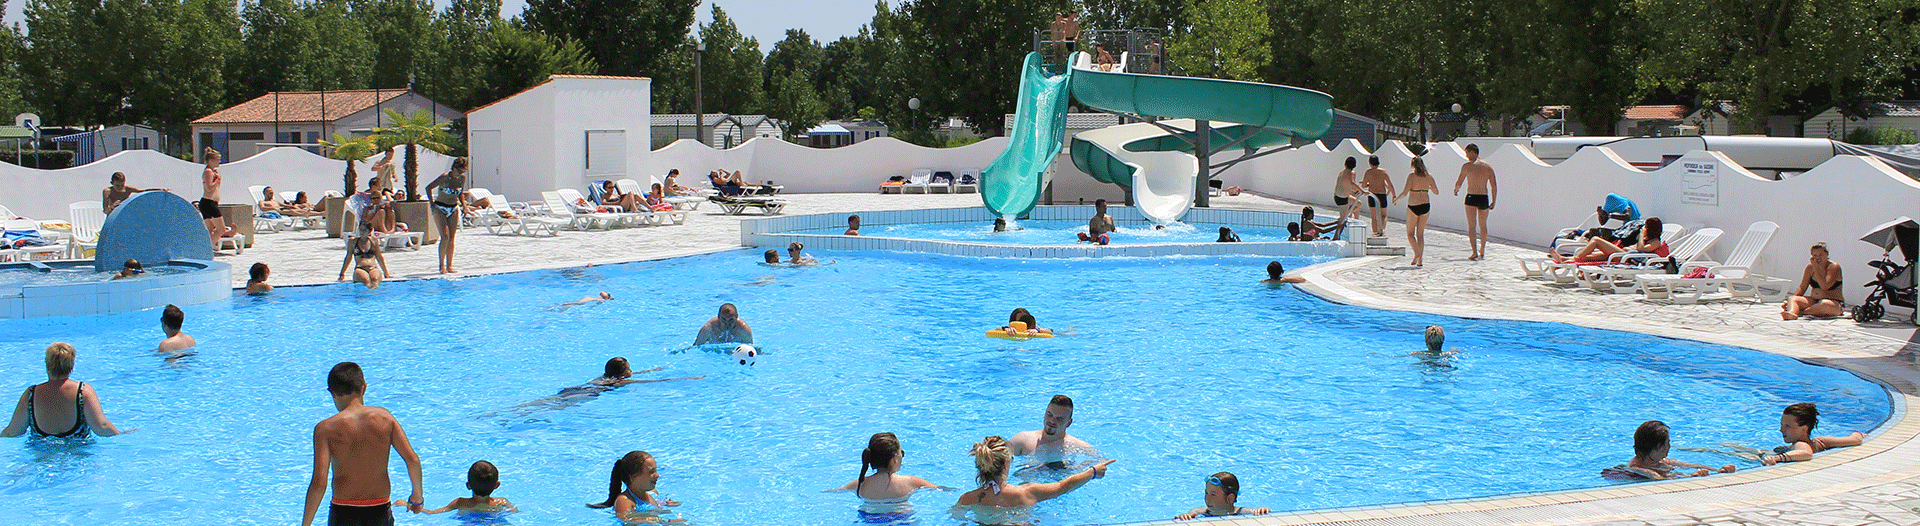 camping-atlantique-vendee-piscine-et-toboggan-slider